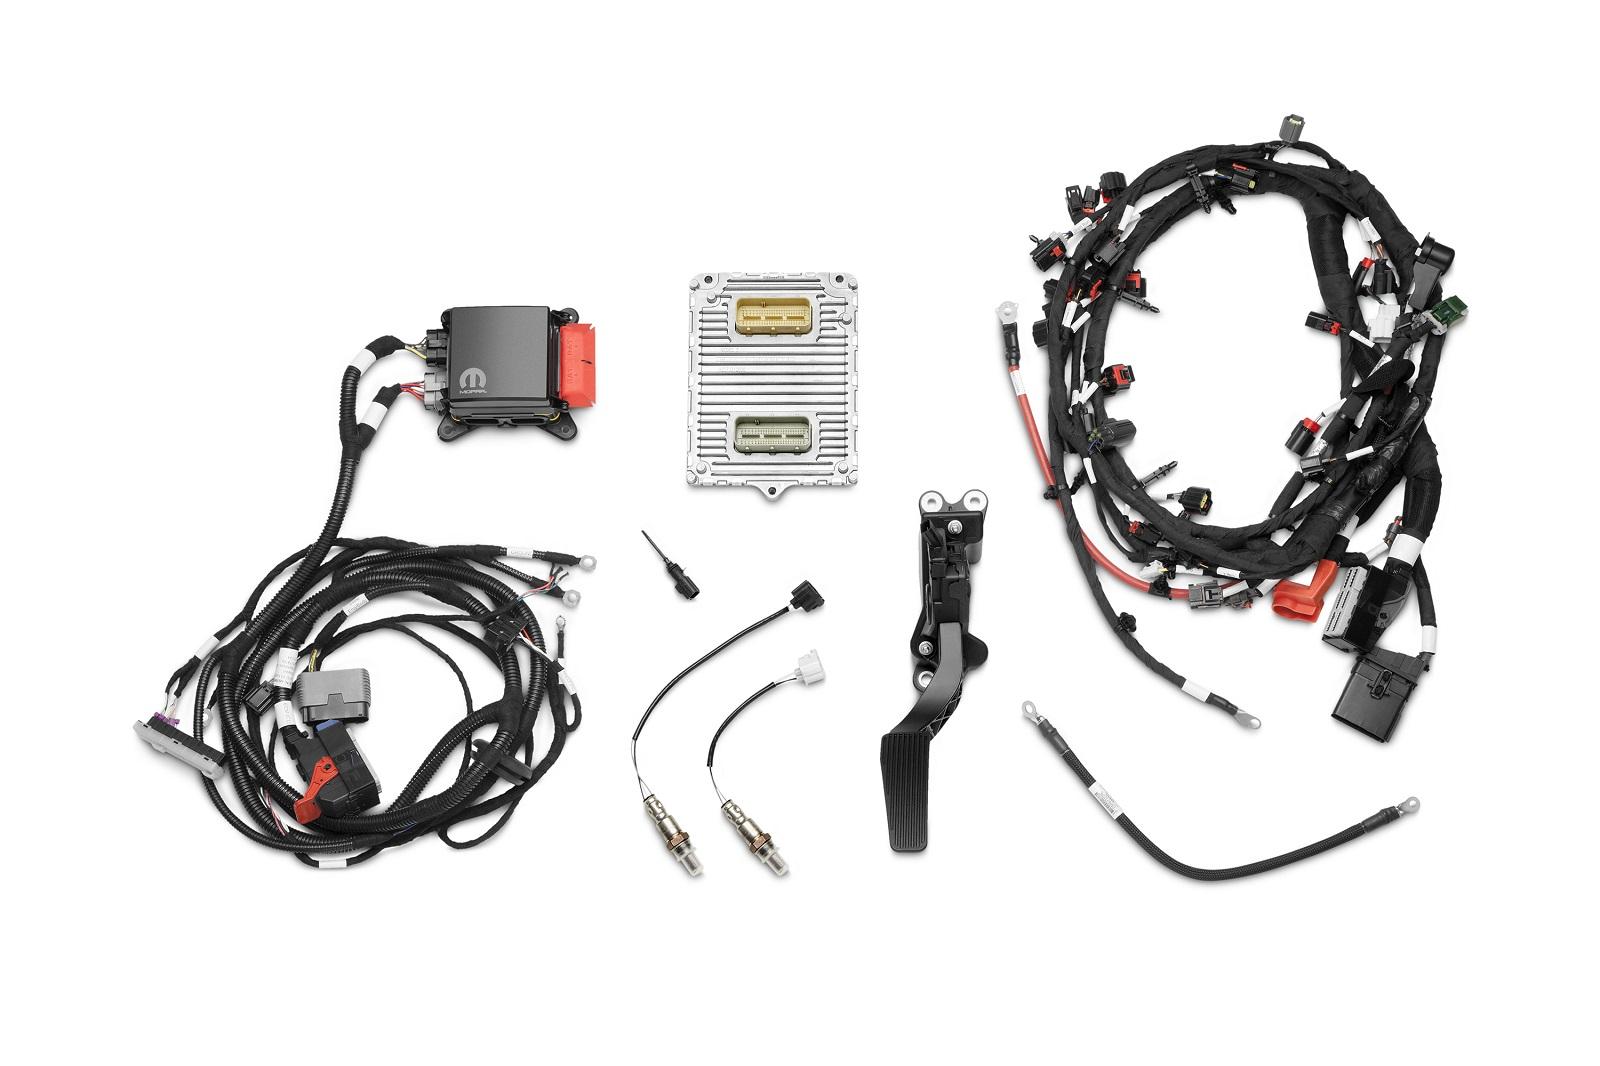 Sema Crate Hemi Engine Kits Help Put Modern